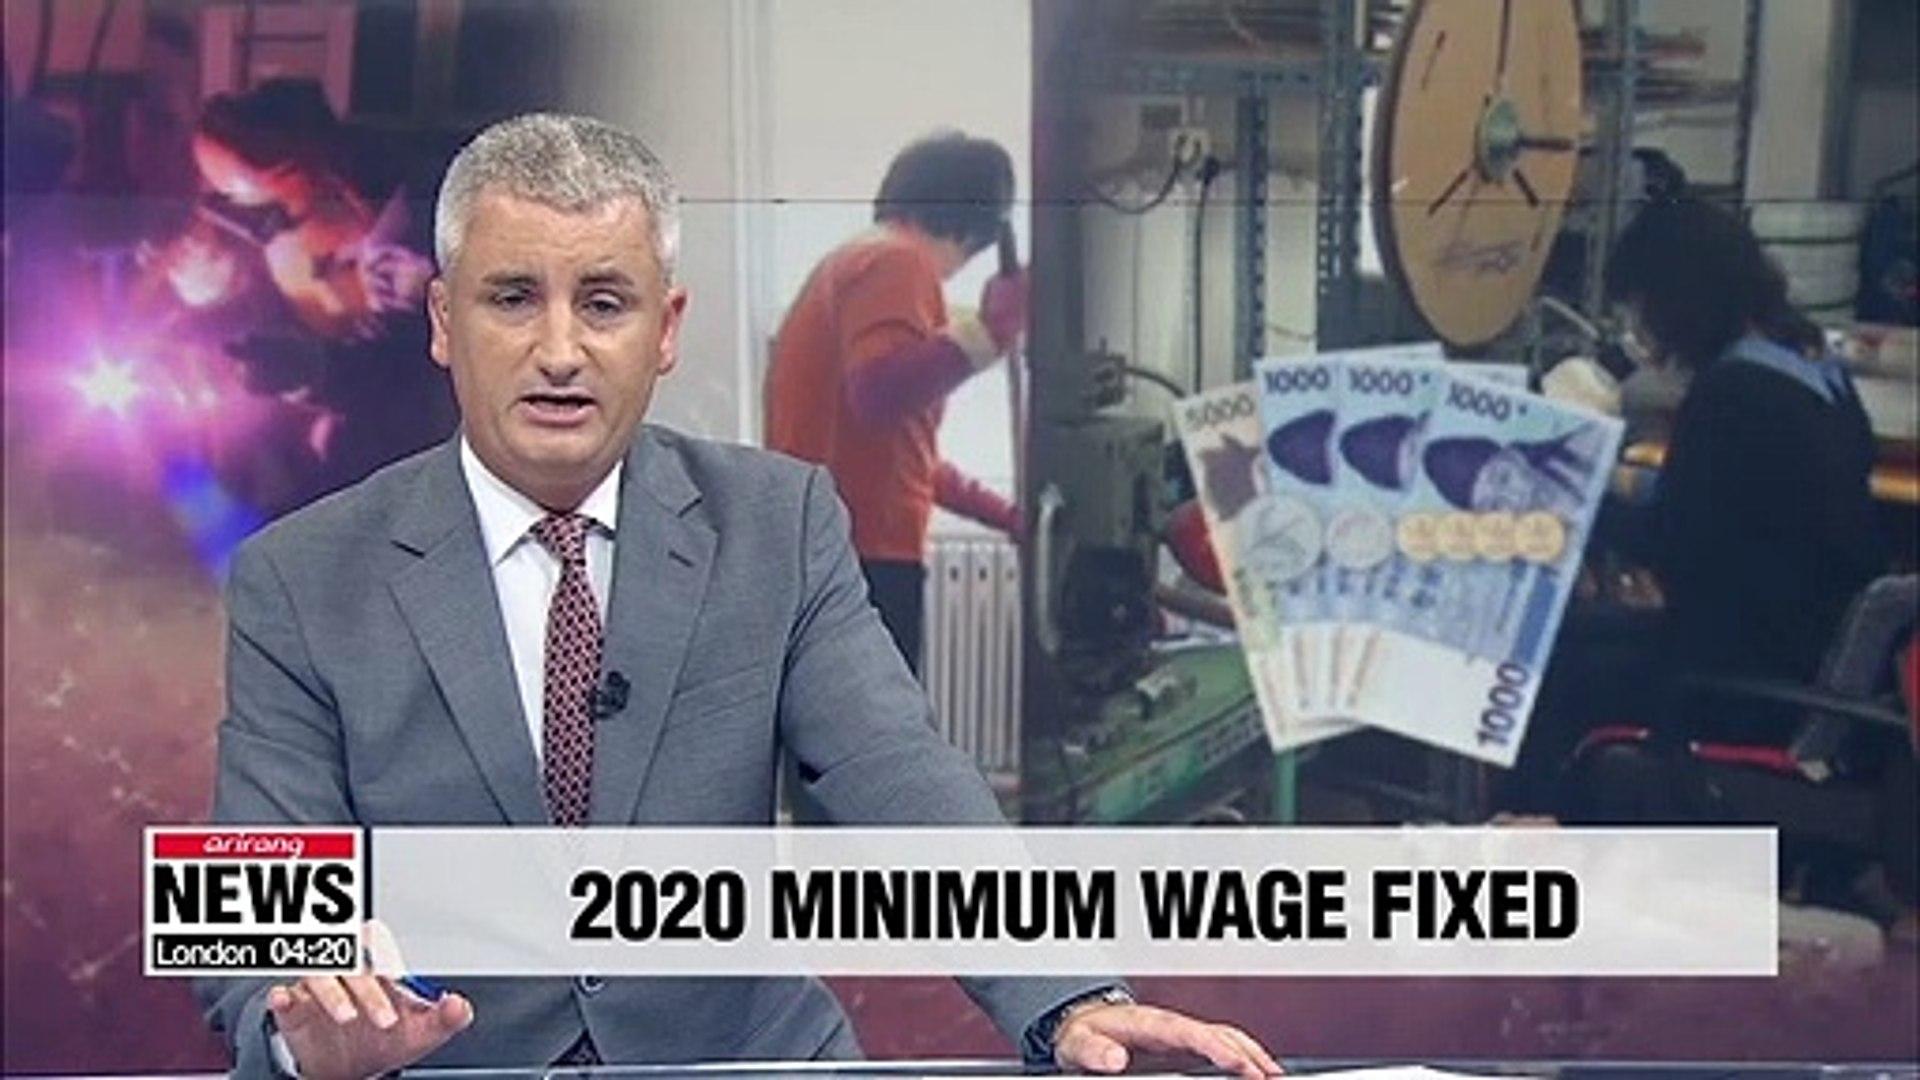 Gov't fixes next year's minimum wage at 8,590 won